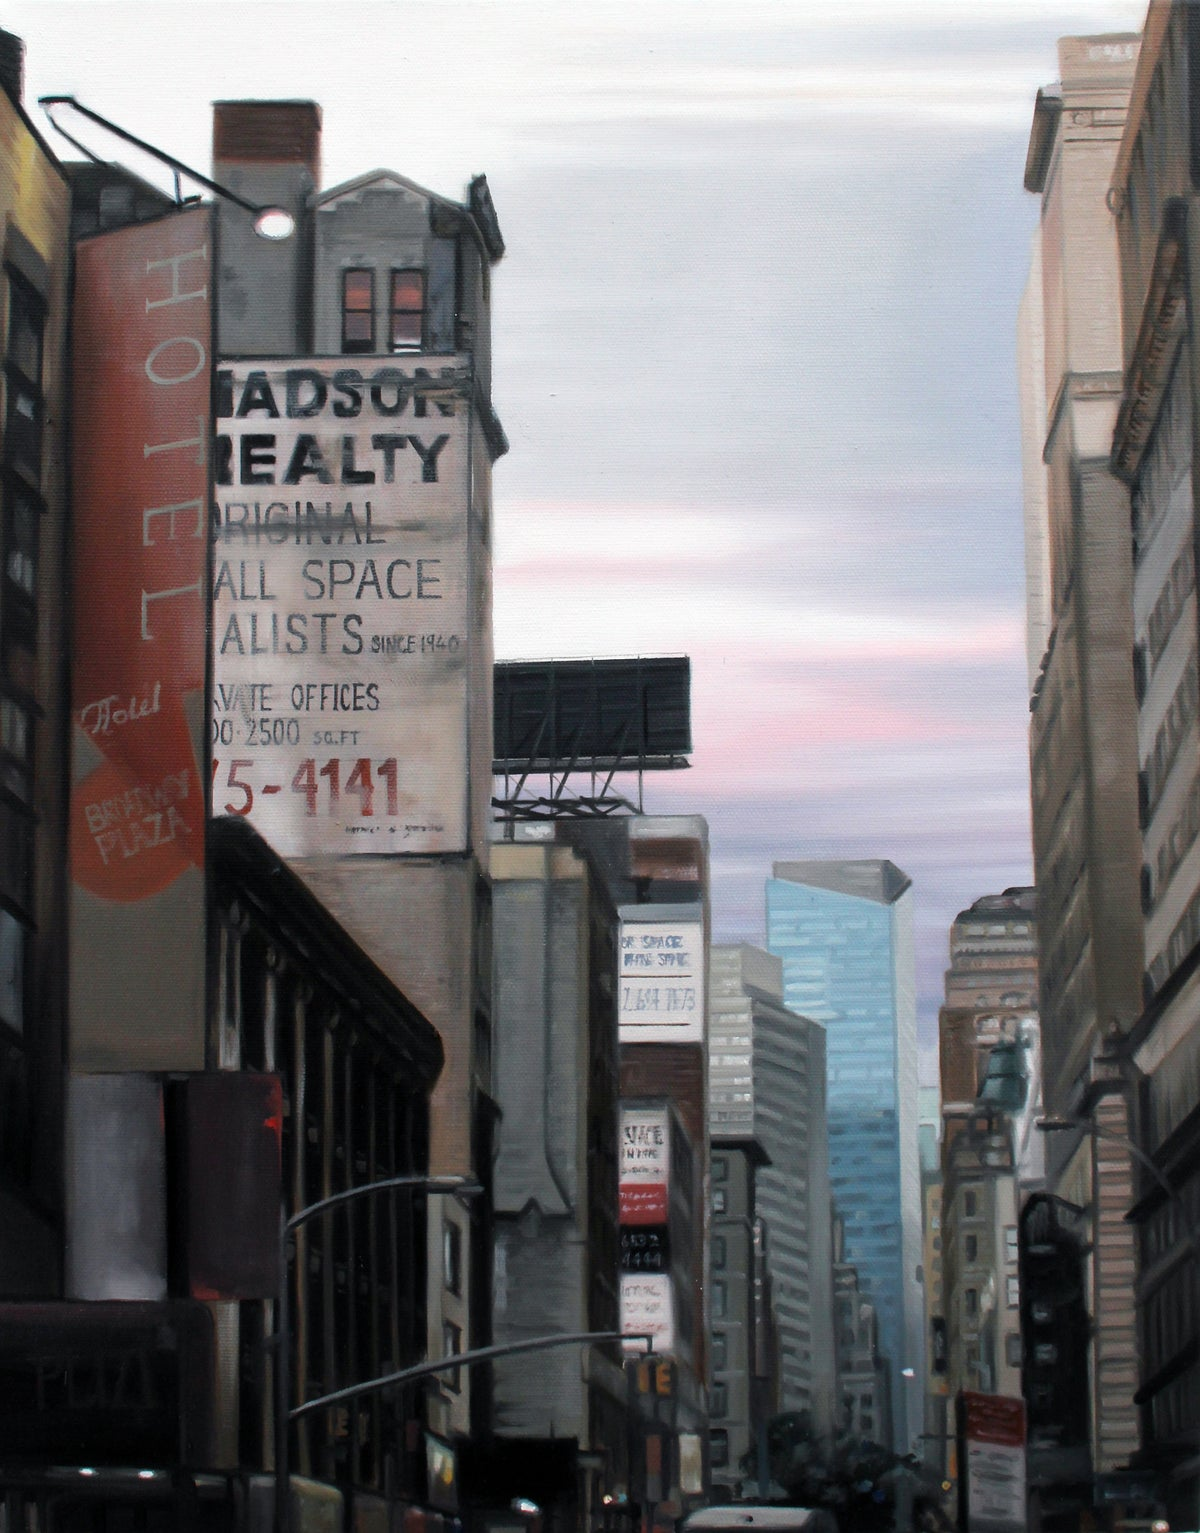 New York Madson // Original Oil Painting